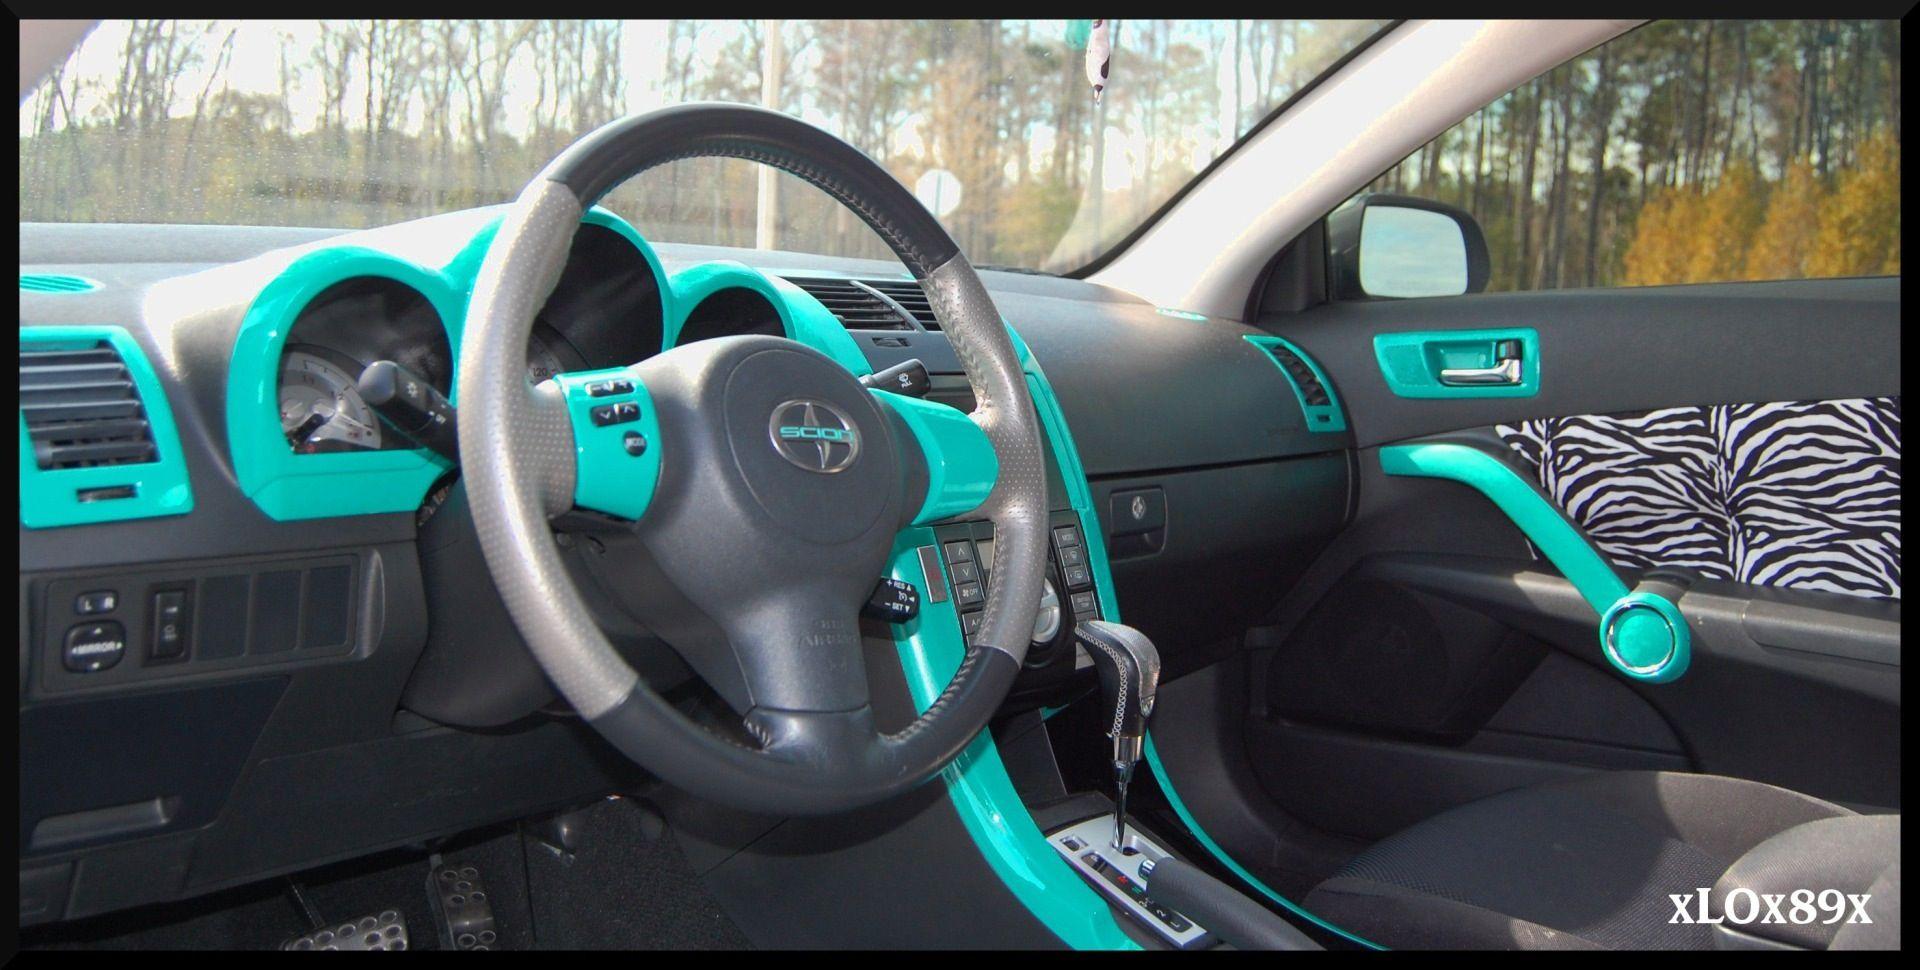 Turquoise Interior But Camo Instead Of Zebra